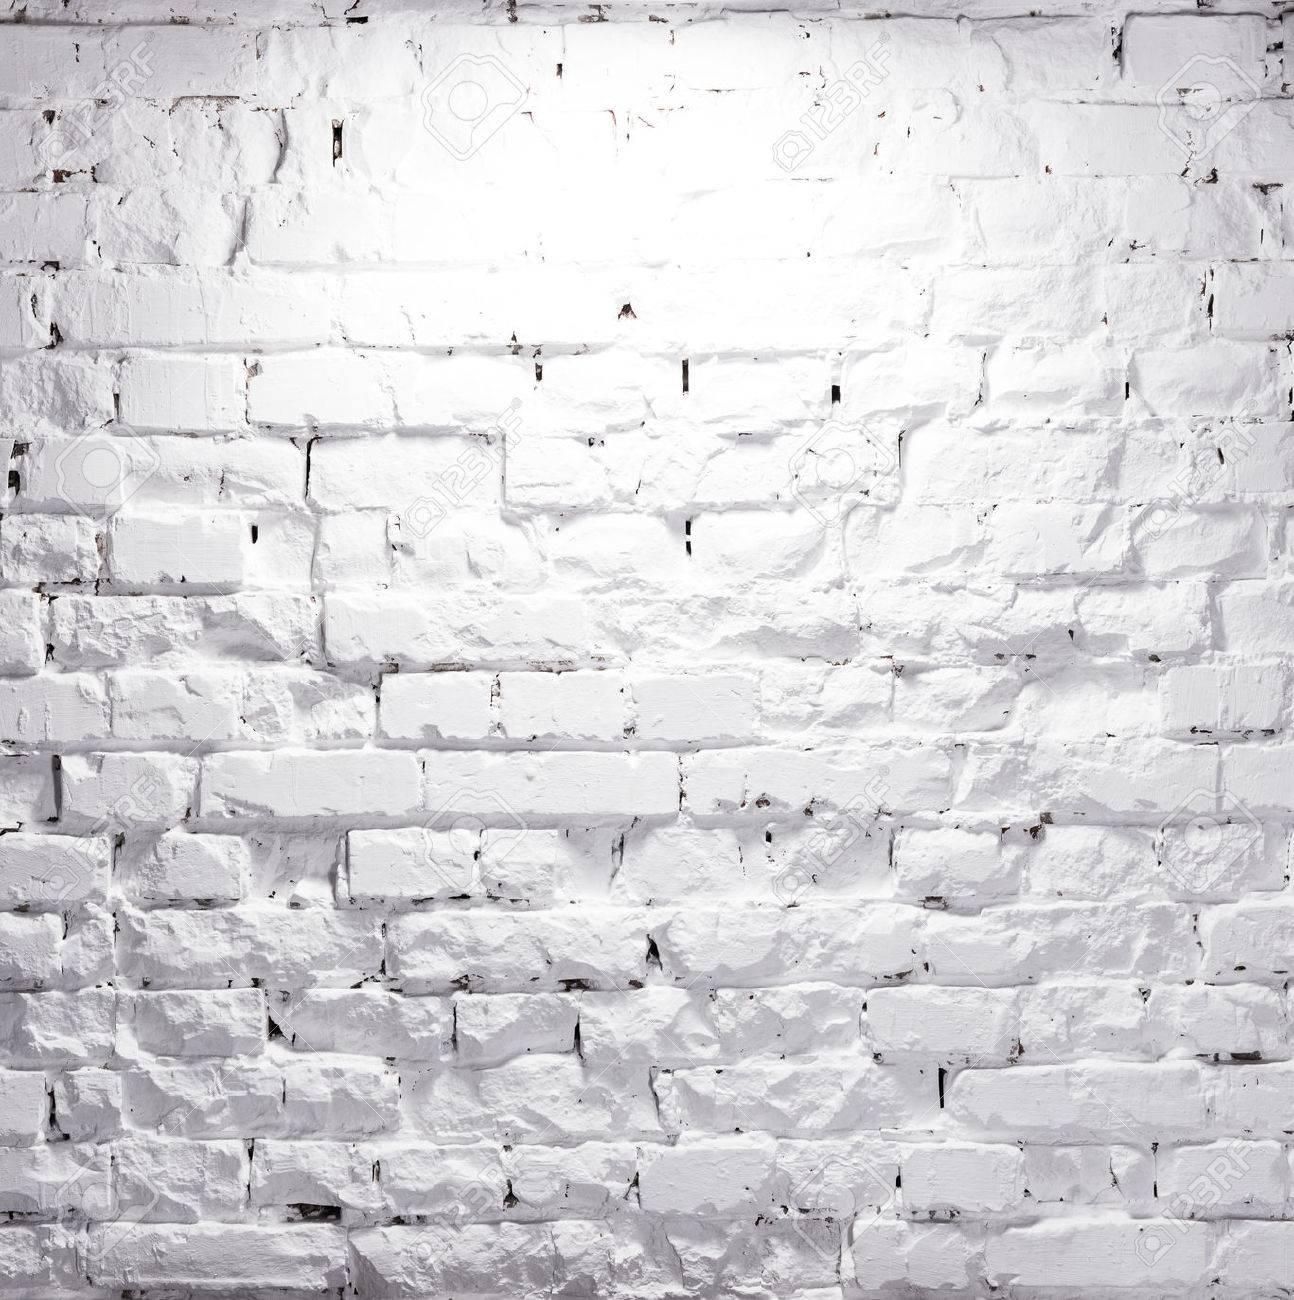 texture of illuminated brick whitewashed wall - 53785876